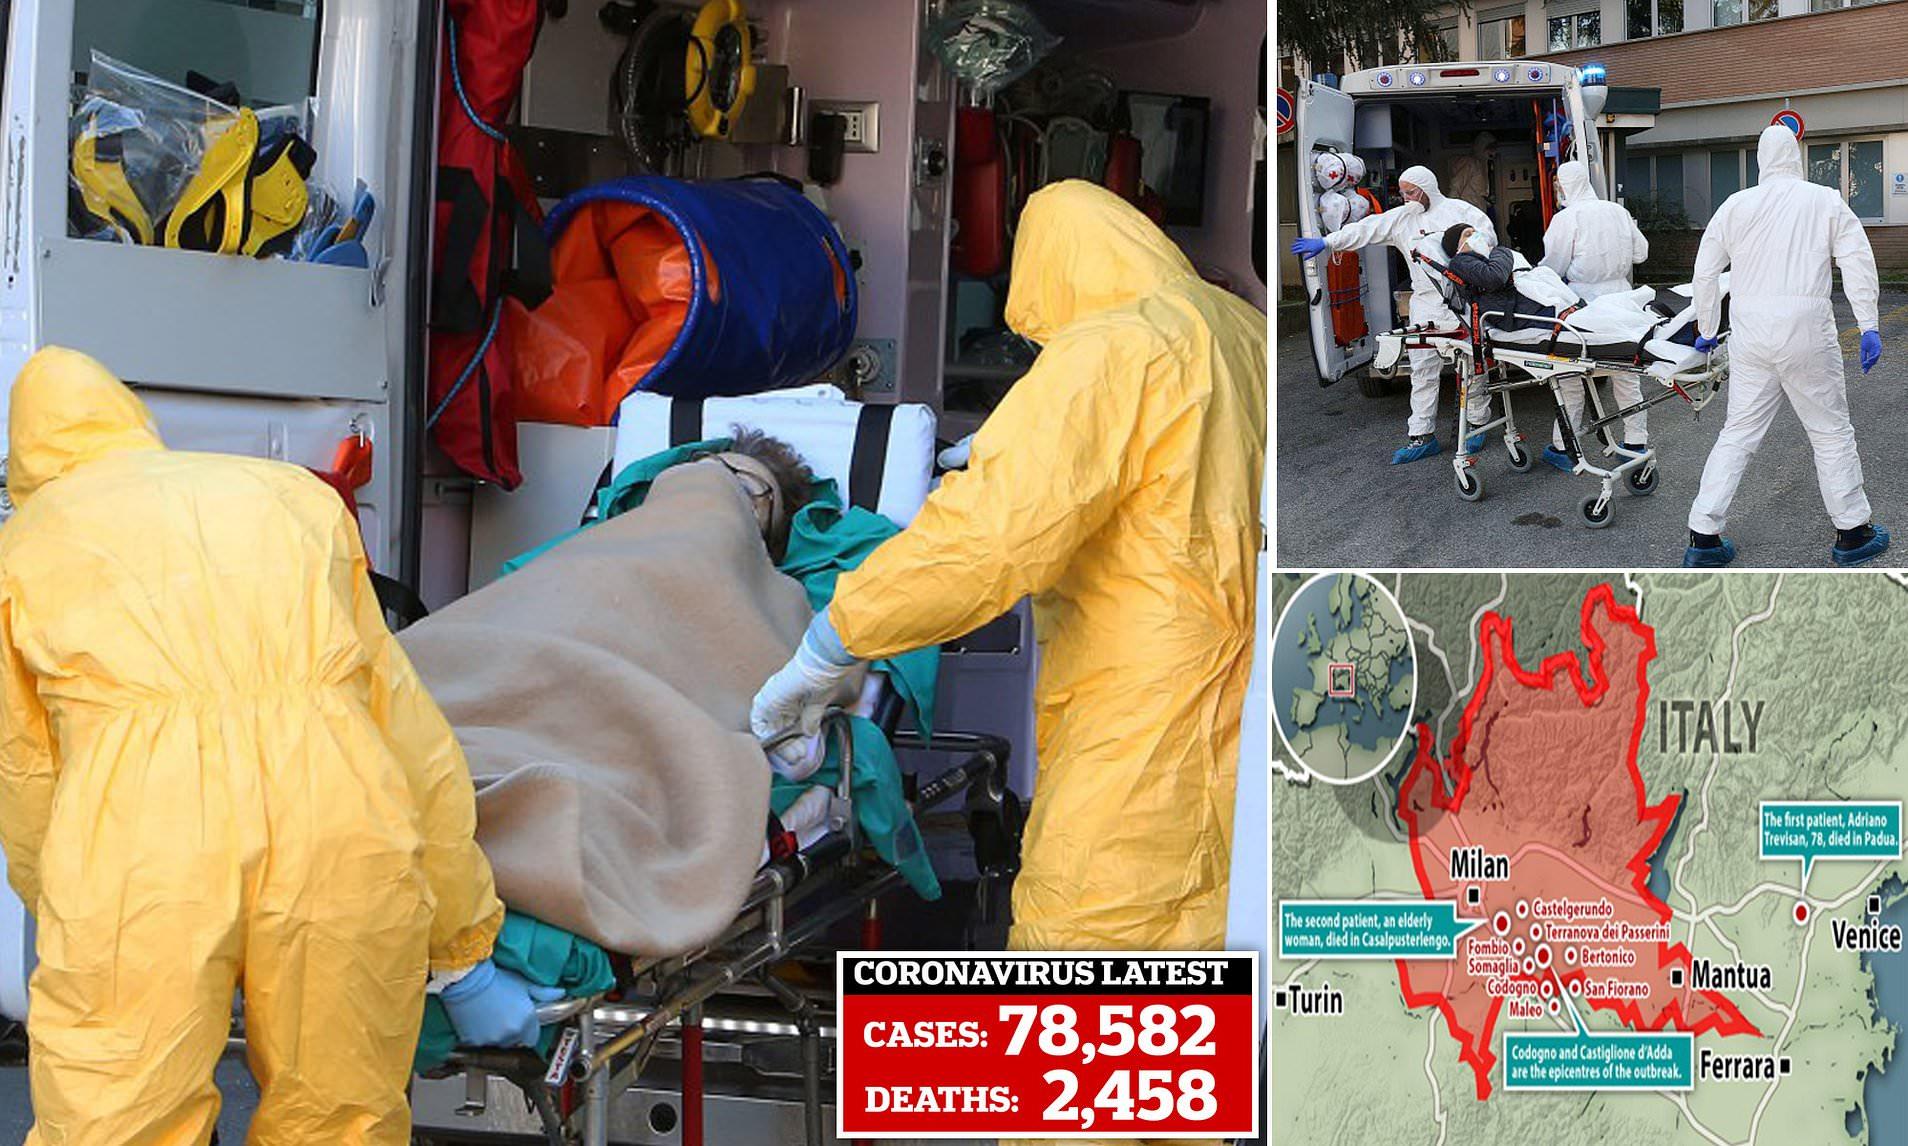 Coronavirus kills two in Italy   Daily Mail Online